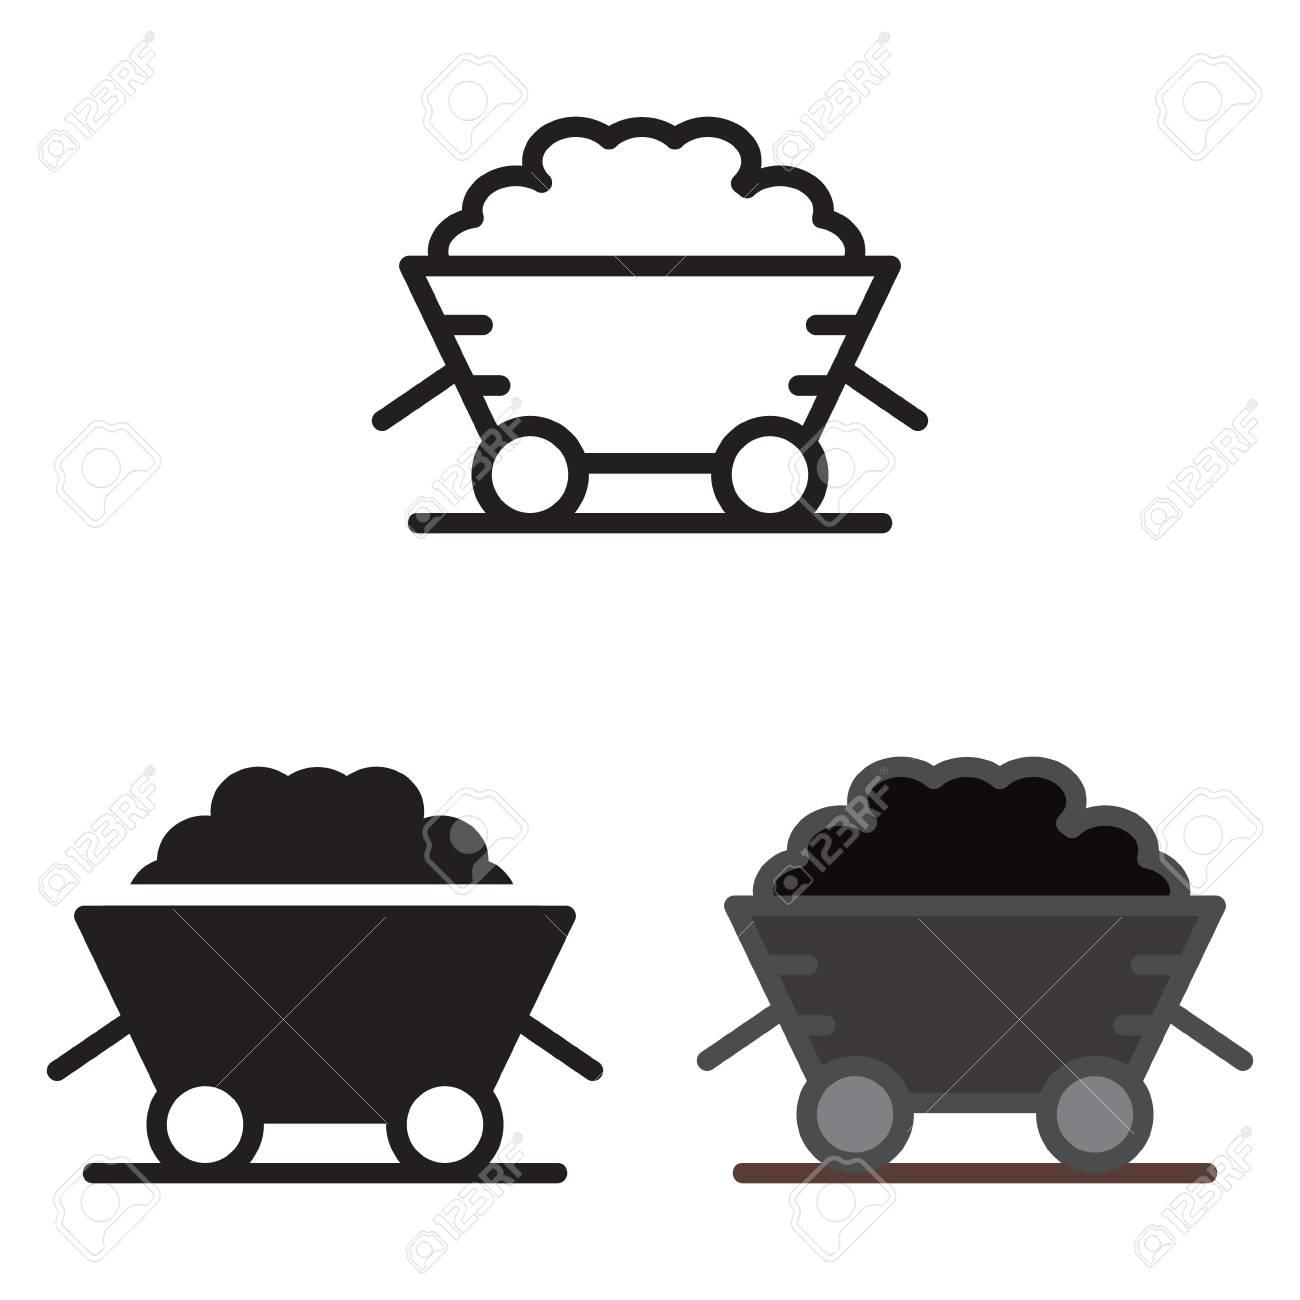 Coal trolley icon vector illustration. - 88641330